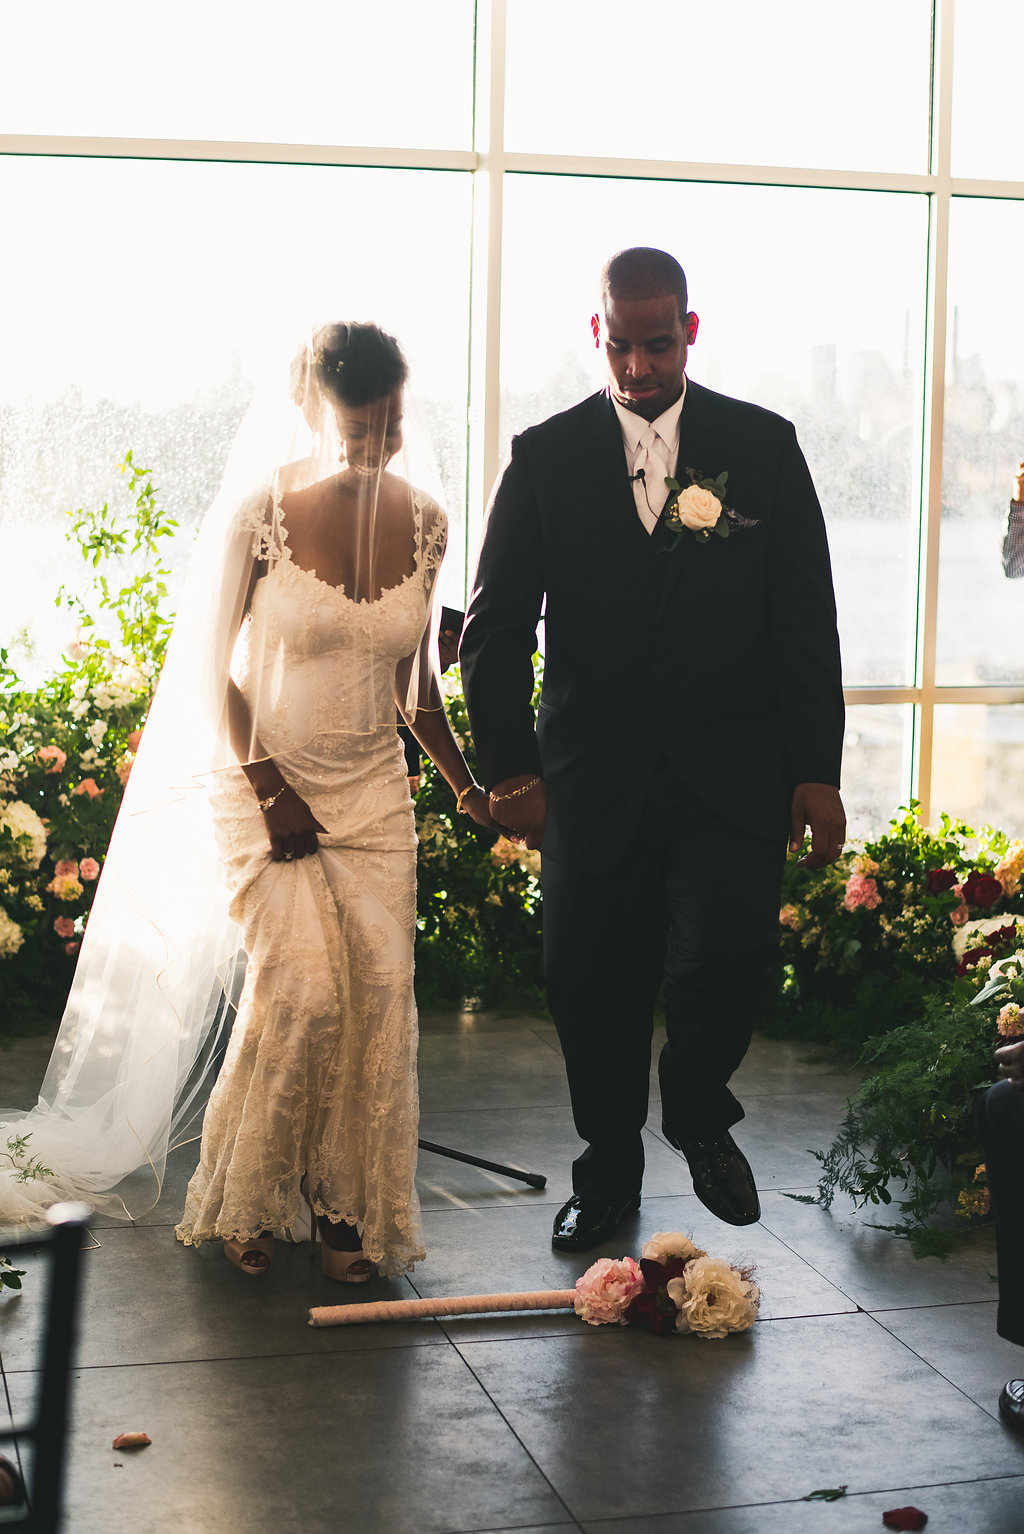 victorious-events-nyc-022-aja-dynel-w-loft-wedding-jrphotony.jpg